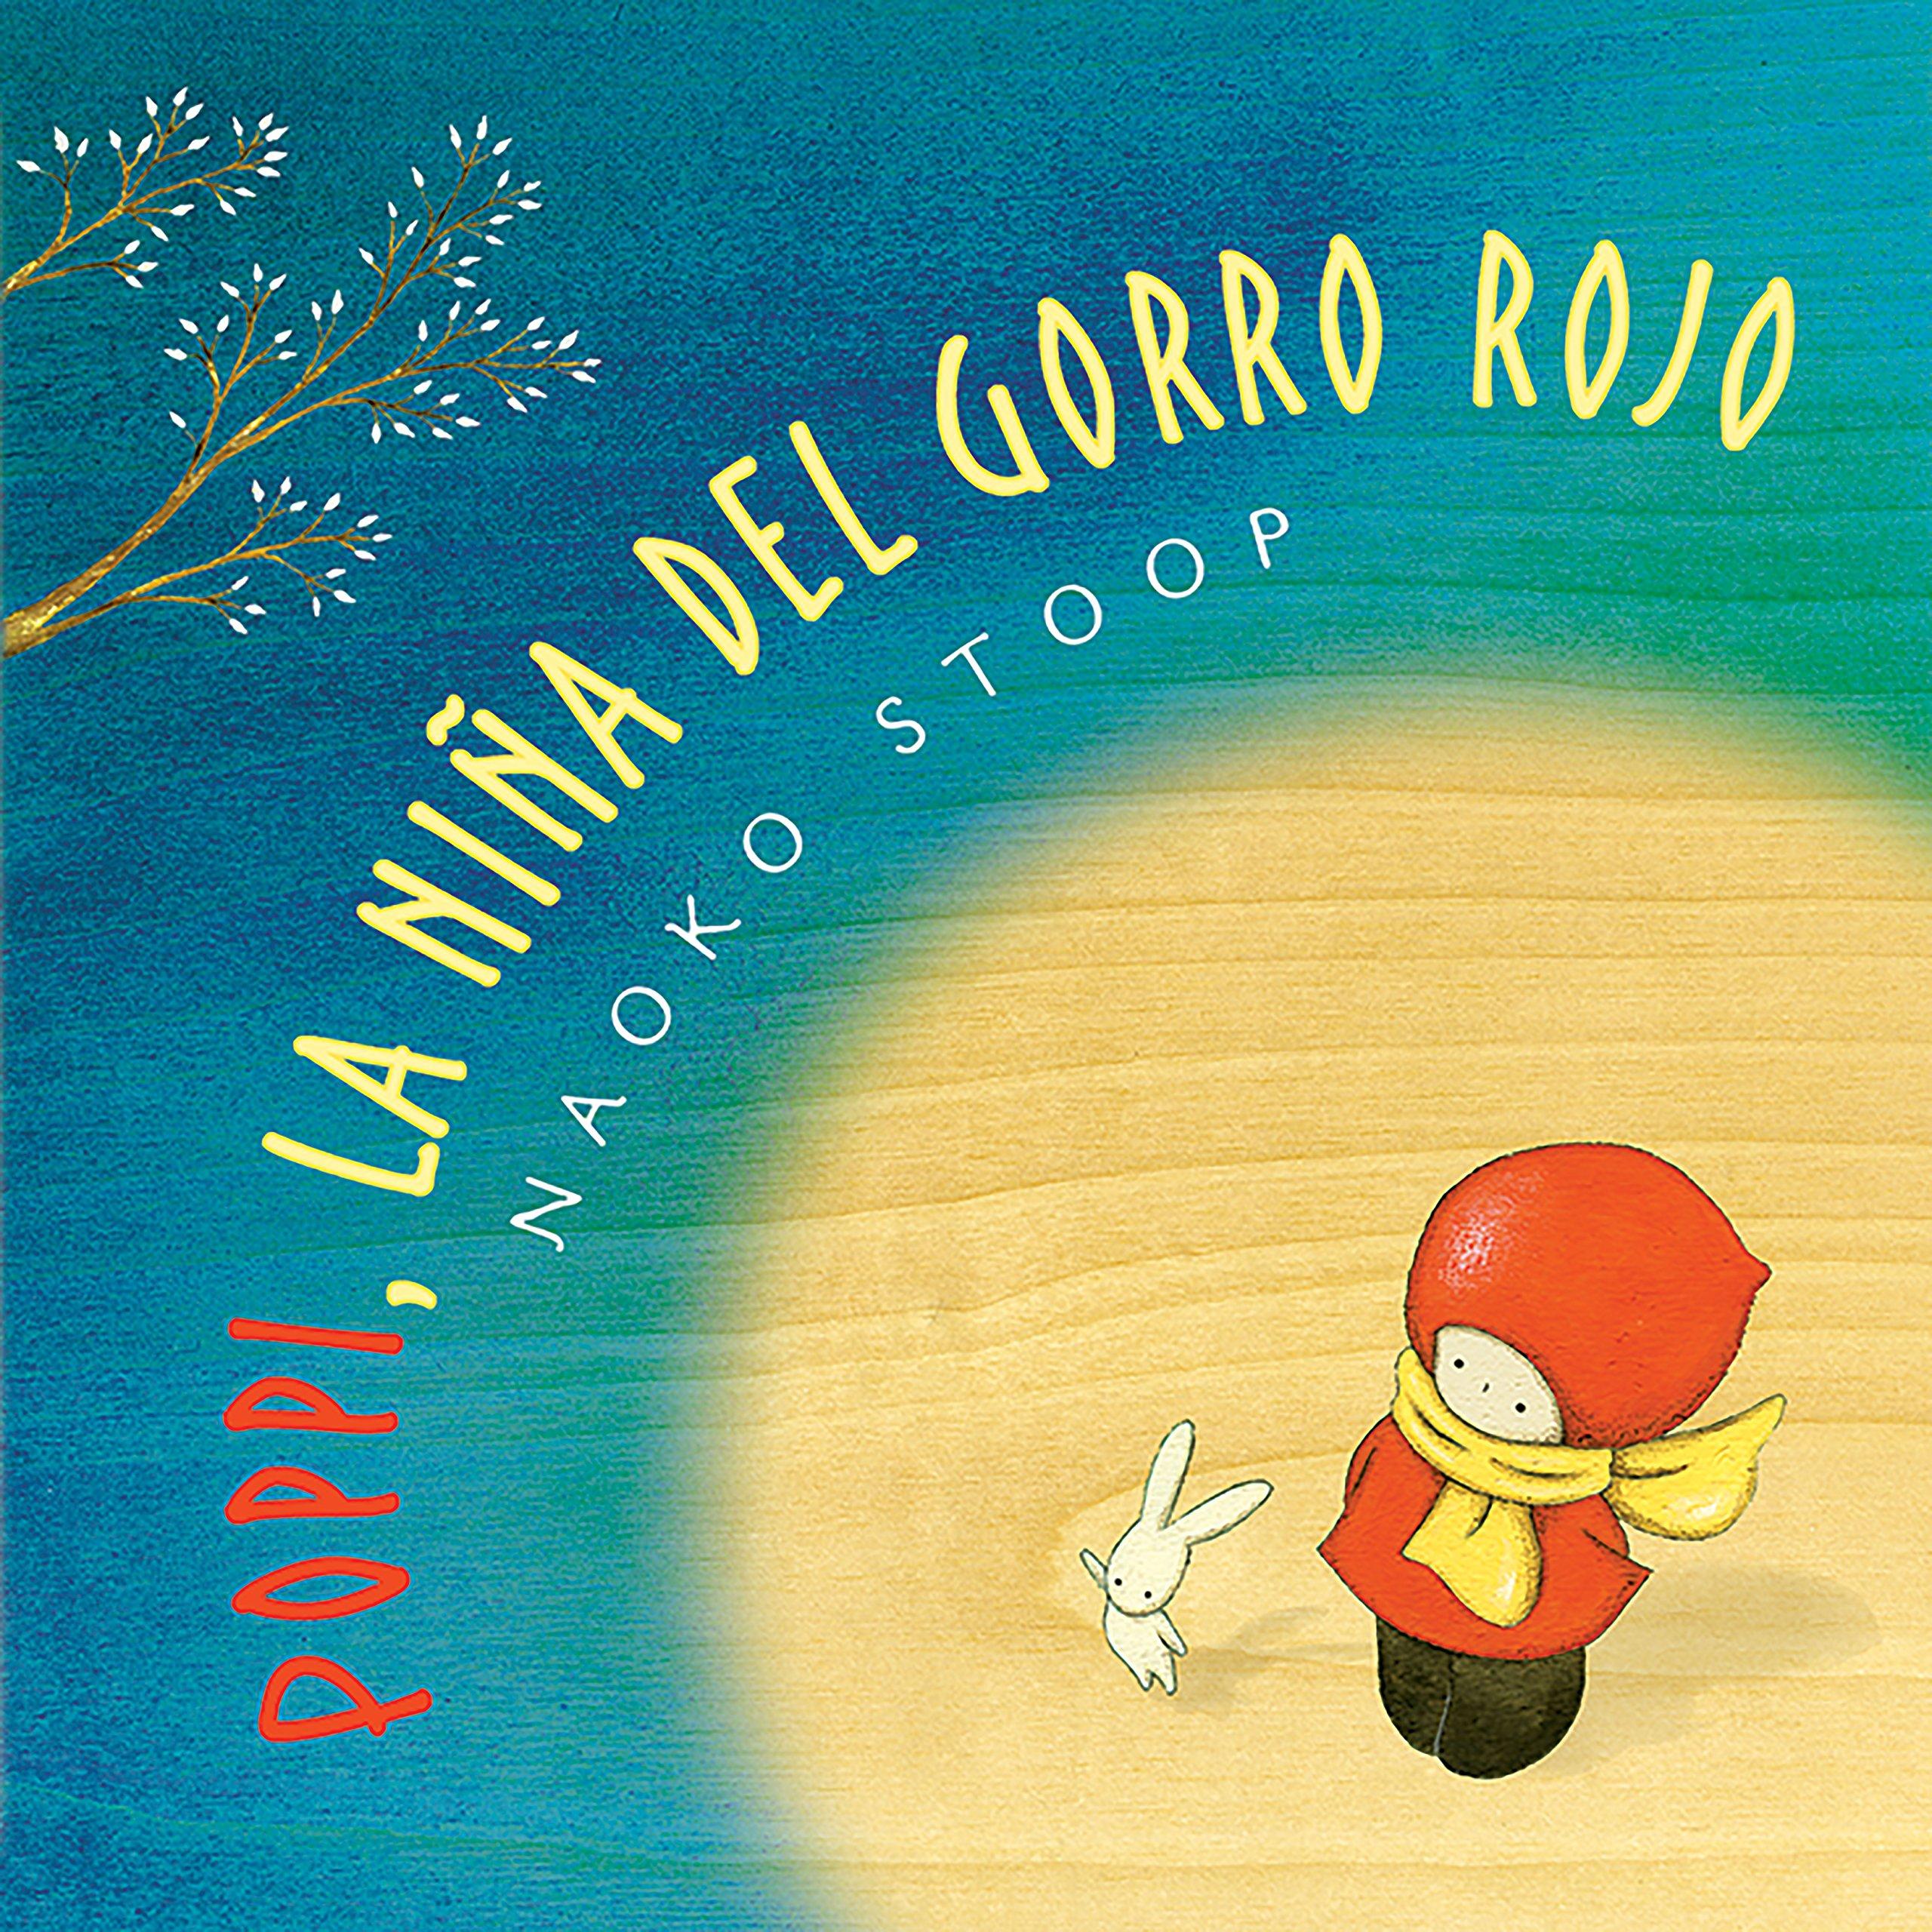 Poppi, la niña del gorro rojo / Red Knit Cap Girl (Spanish Edition): Naoko Stoop: 9788448851019: Amazon.com: Books